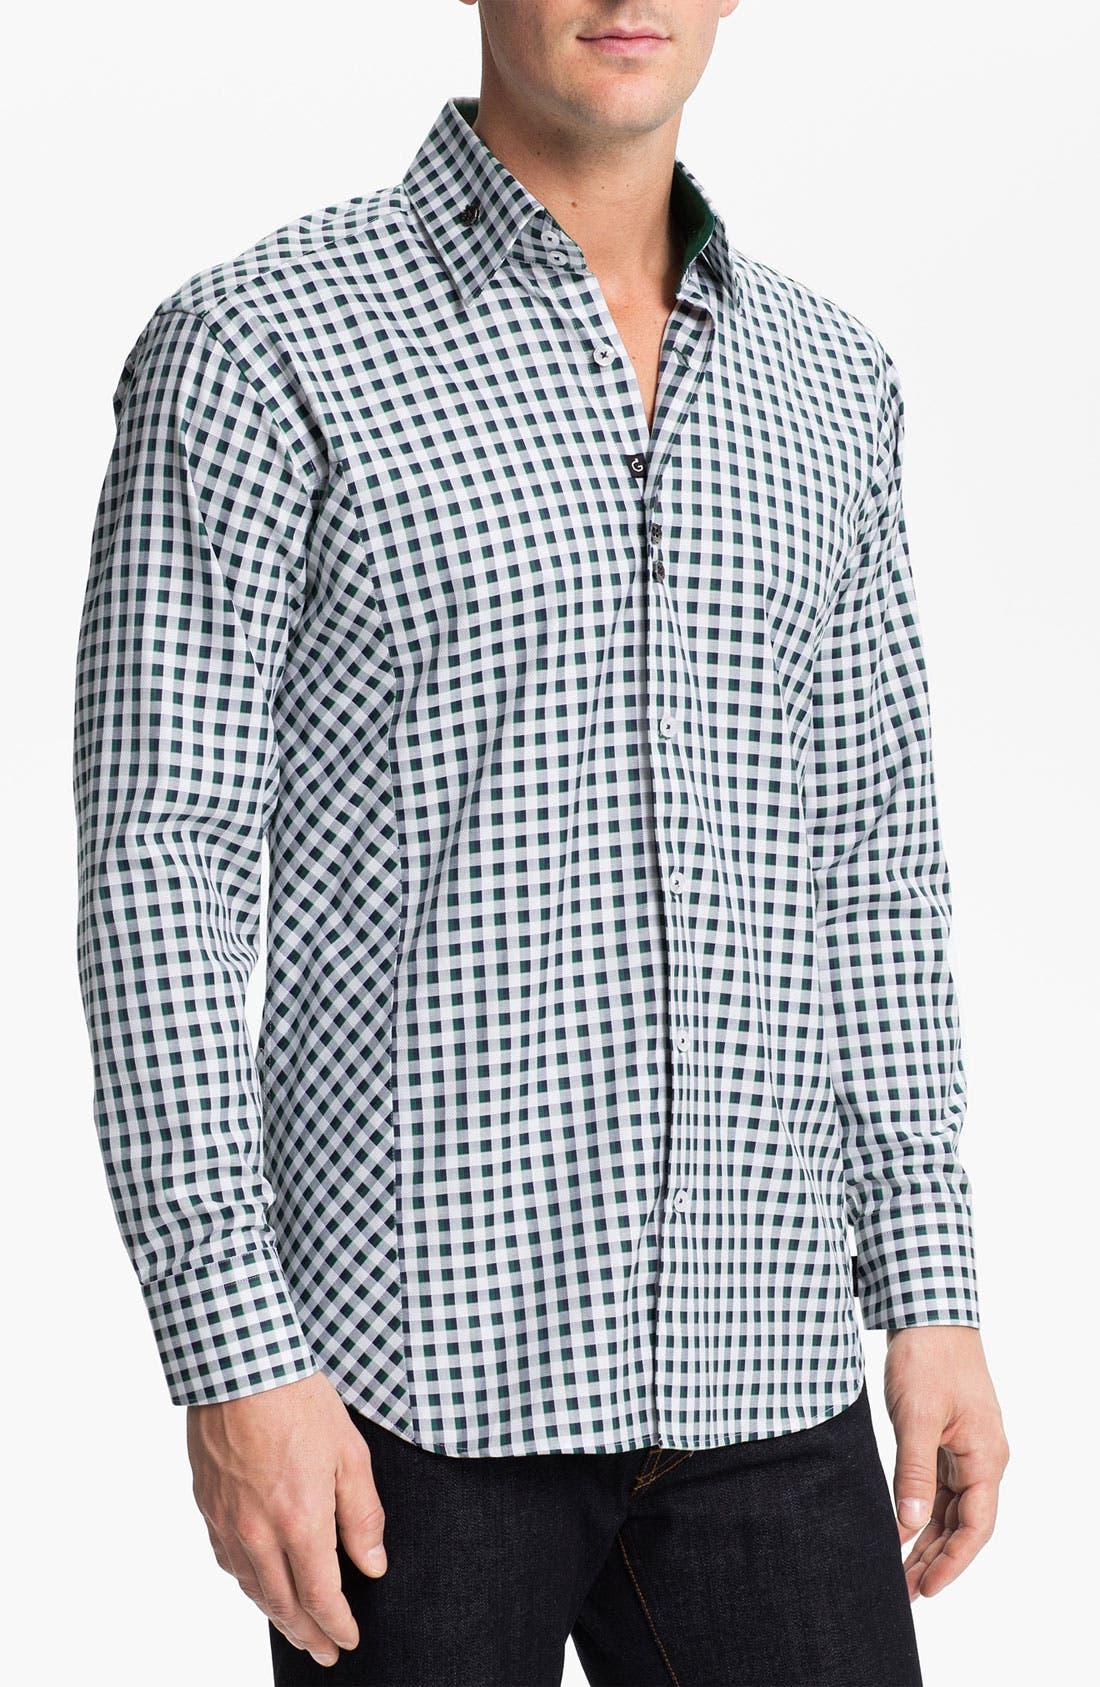 Alternate Image 1 Selected - Bogosse 'Clau 52' Trim Fit Sport Shirt